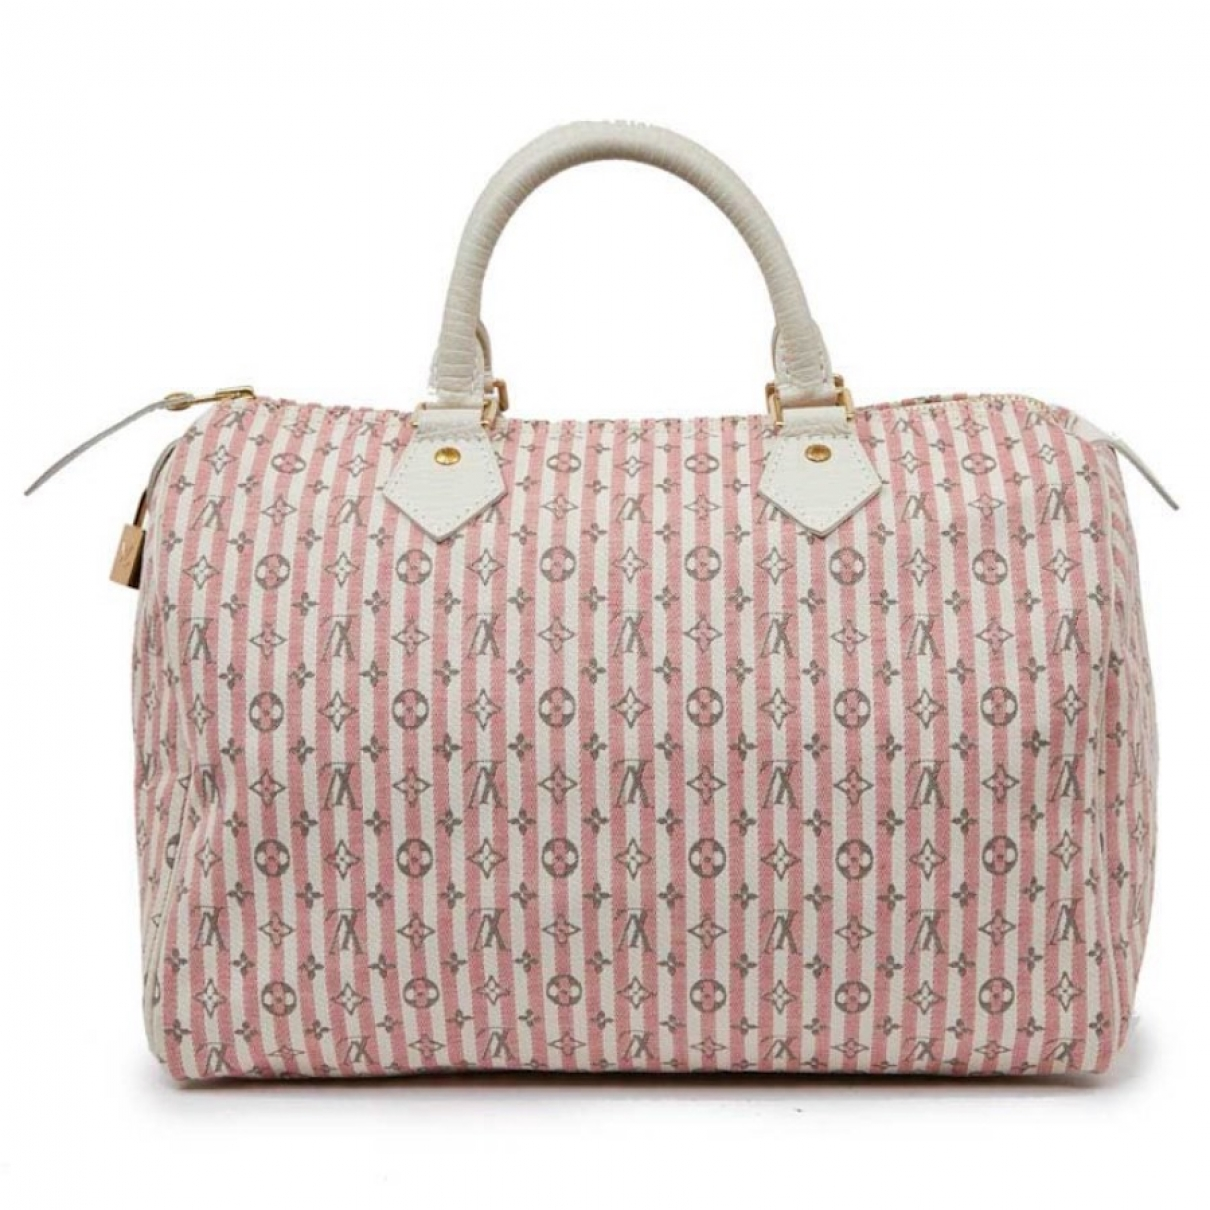 Louis Vuitton - Sac a main Speedy pour femme en toile - rose